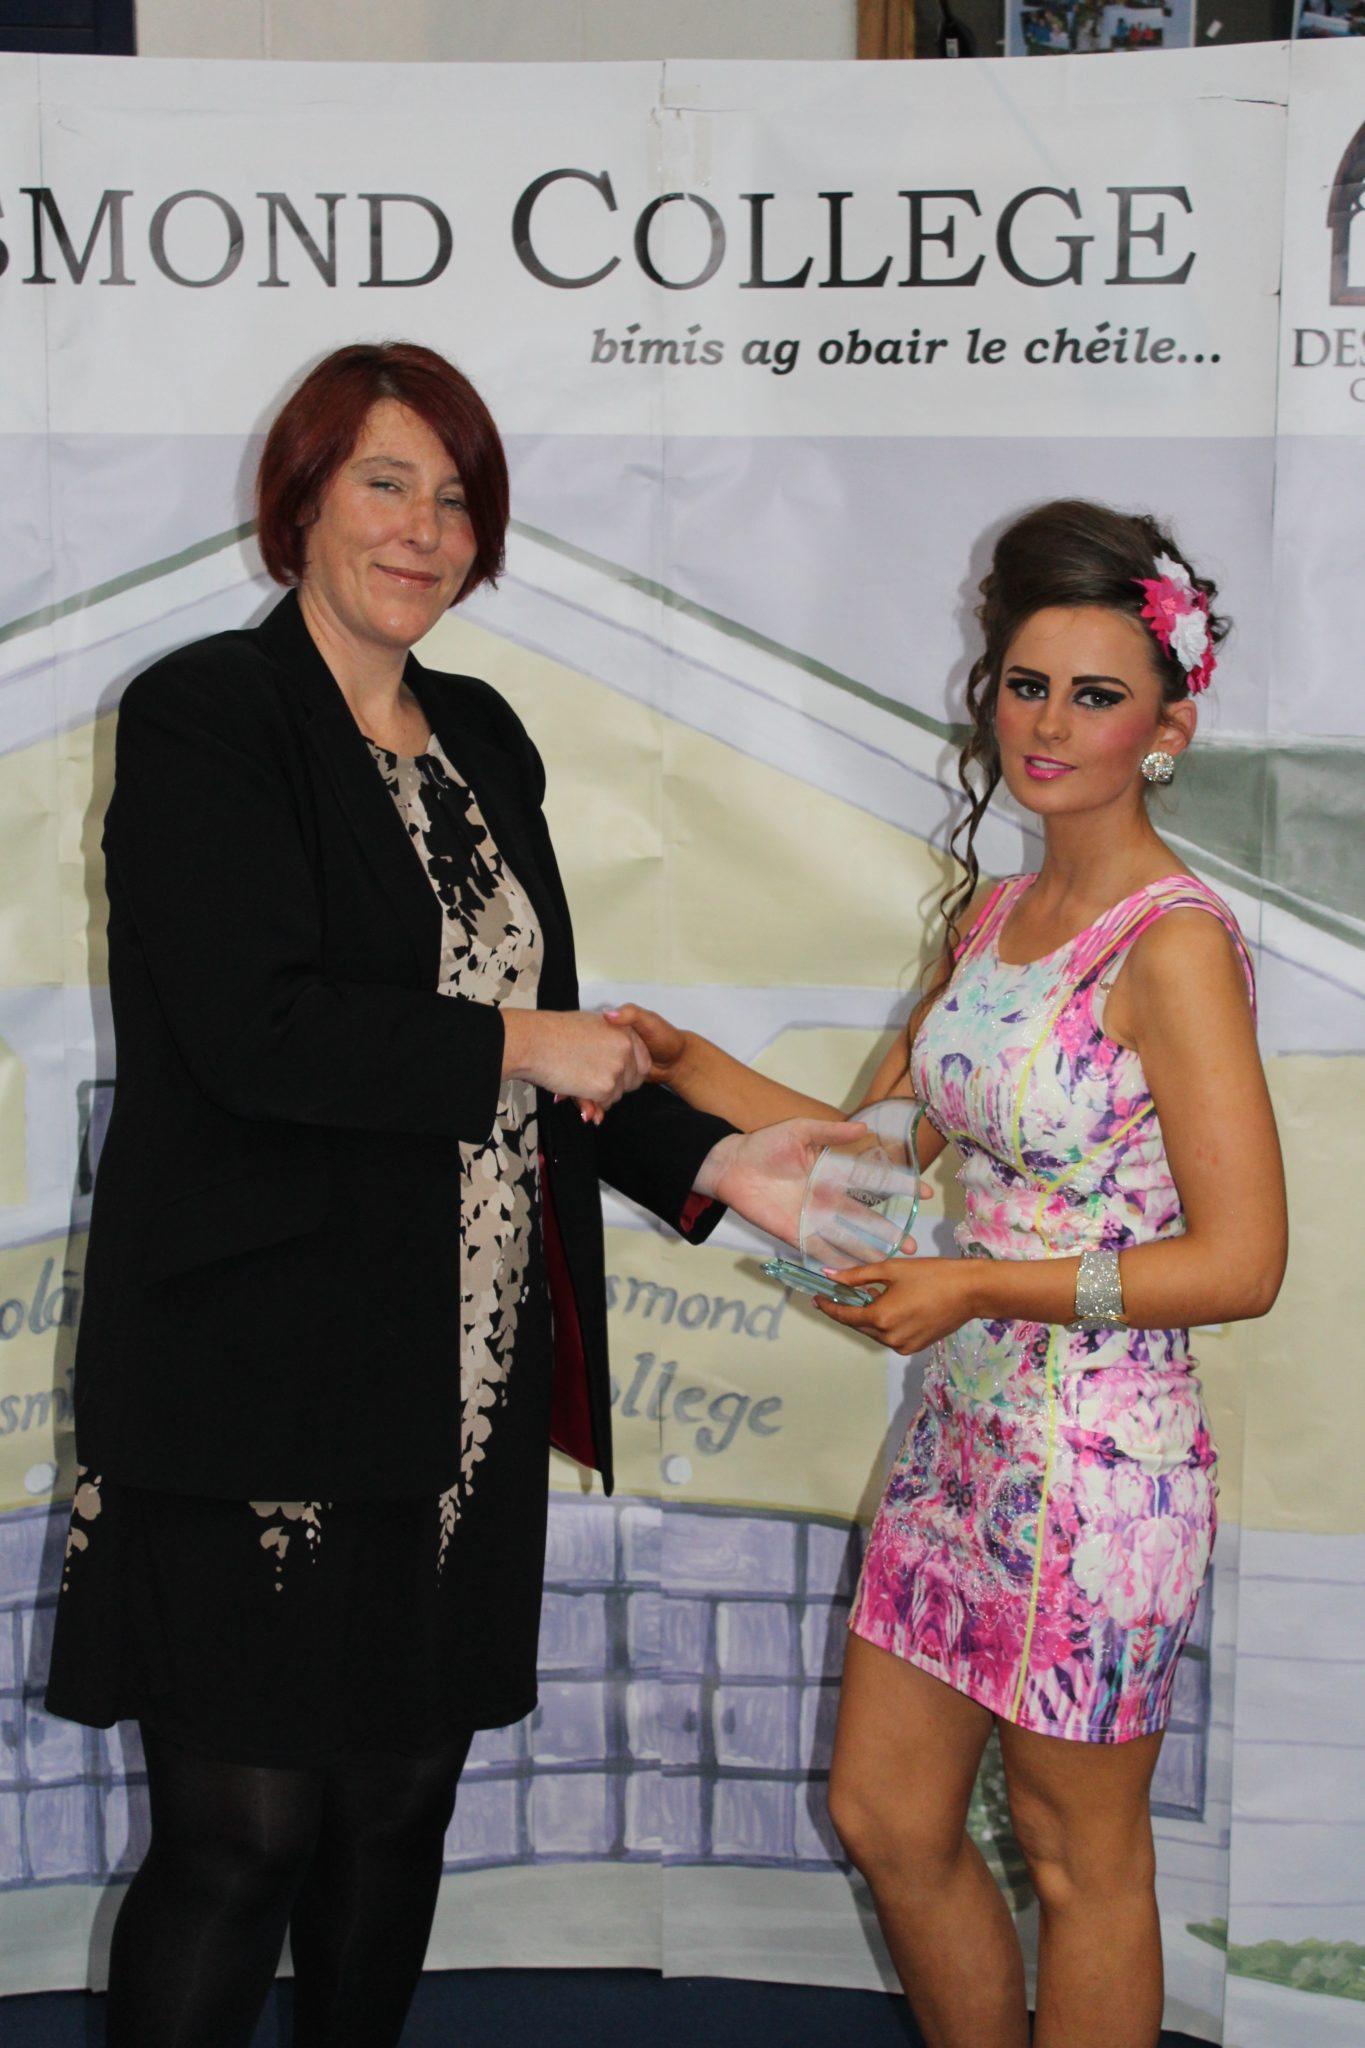 Desmond College Leaving Certificate Graduation 2015: Class Tutor Awards: Chantelle Coady with Ms McCarthy